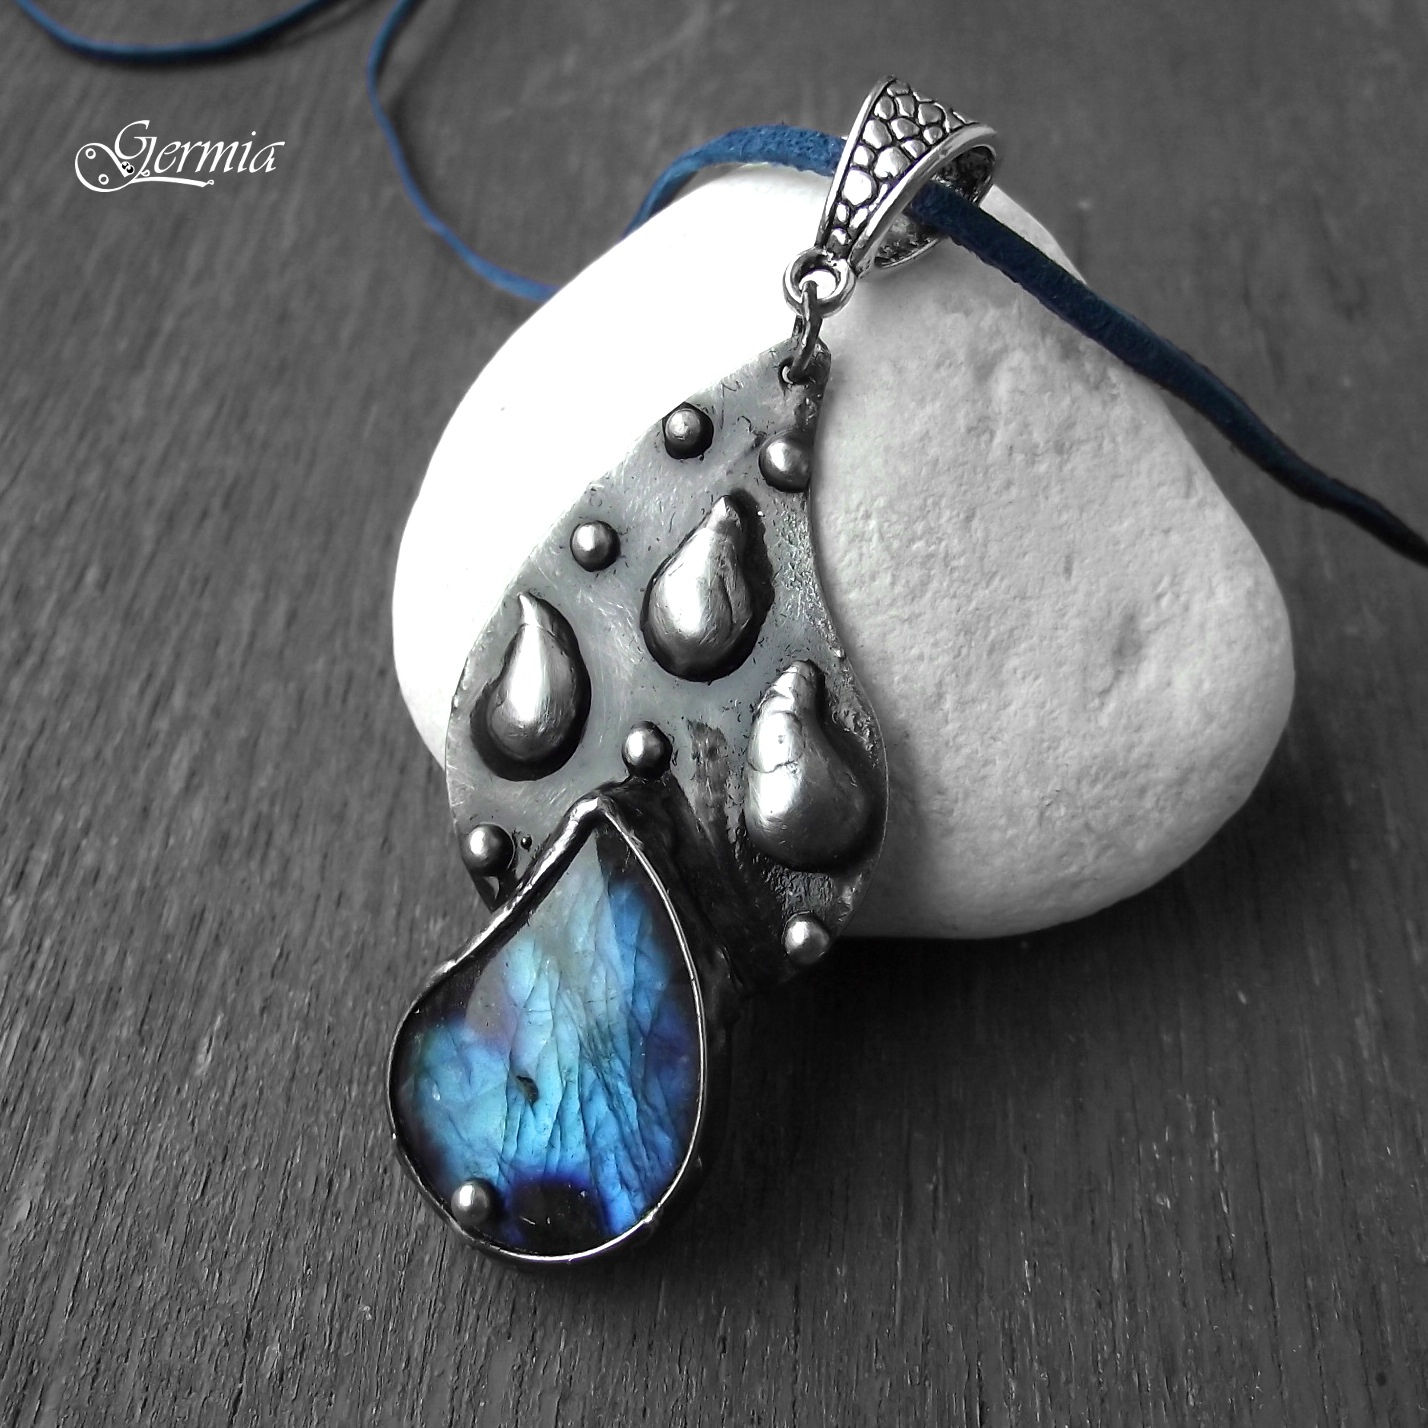 Genuine Turquoise Rings For Women